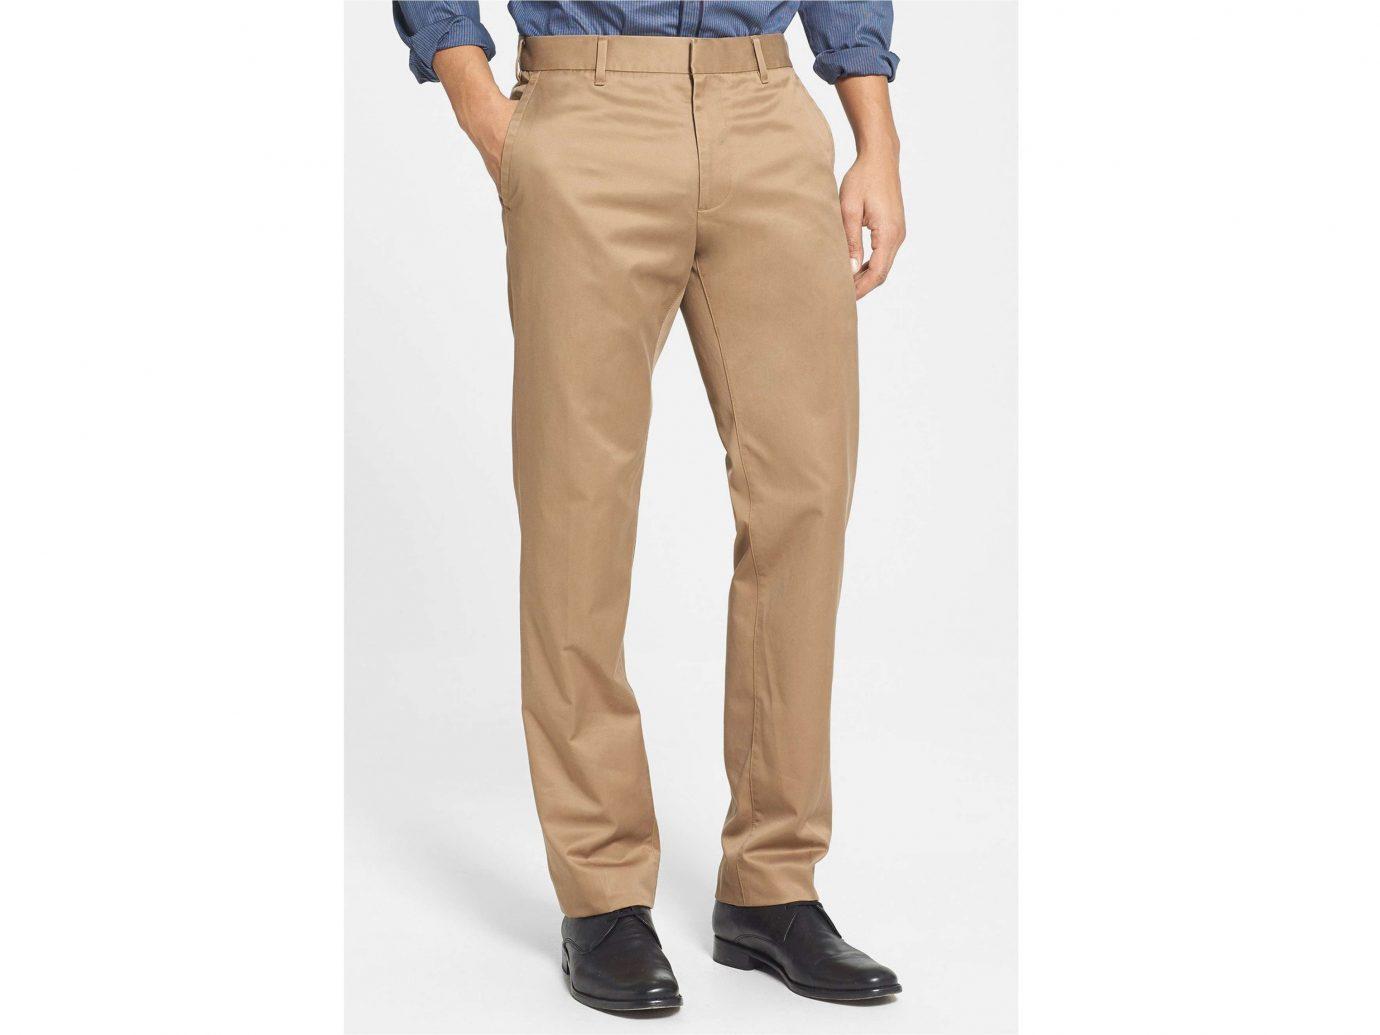 Style + Design Travel Shop clothing person khaki trouser wearing standing posing jeans trousers waist suit beige pocket active pants male